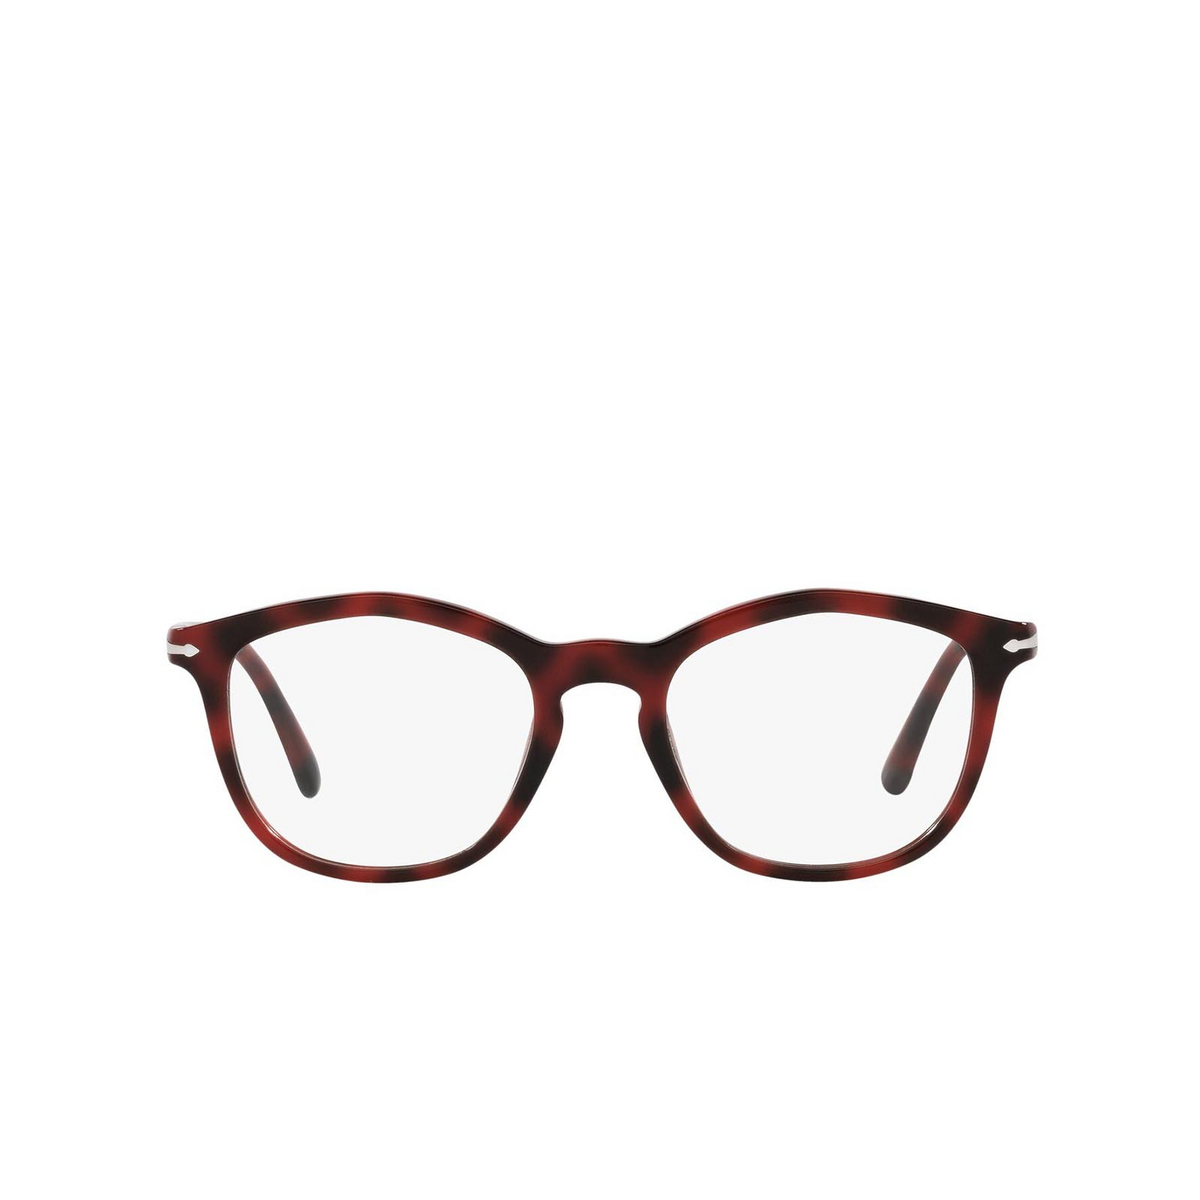 Persol® Irregular Eyeglasses: PO3267V color Red 1100 - front view.